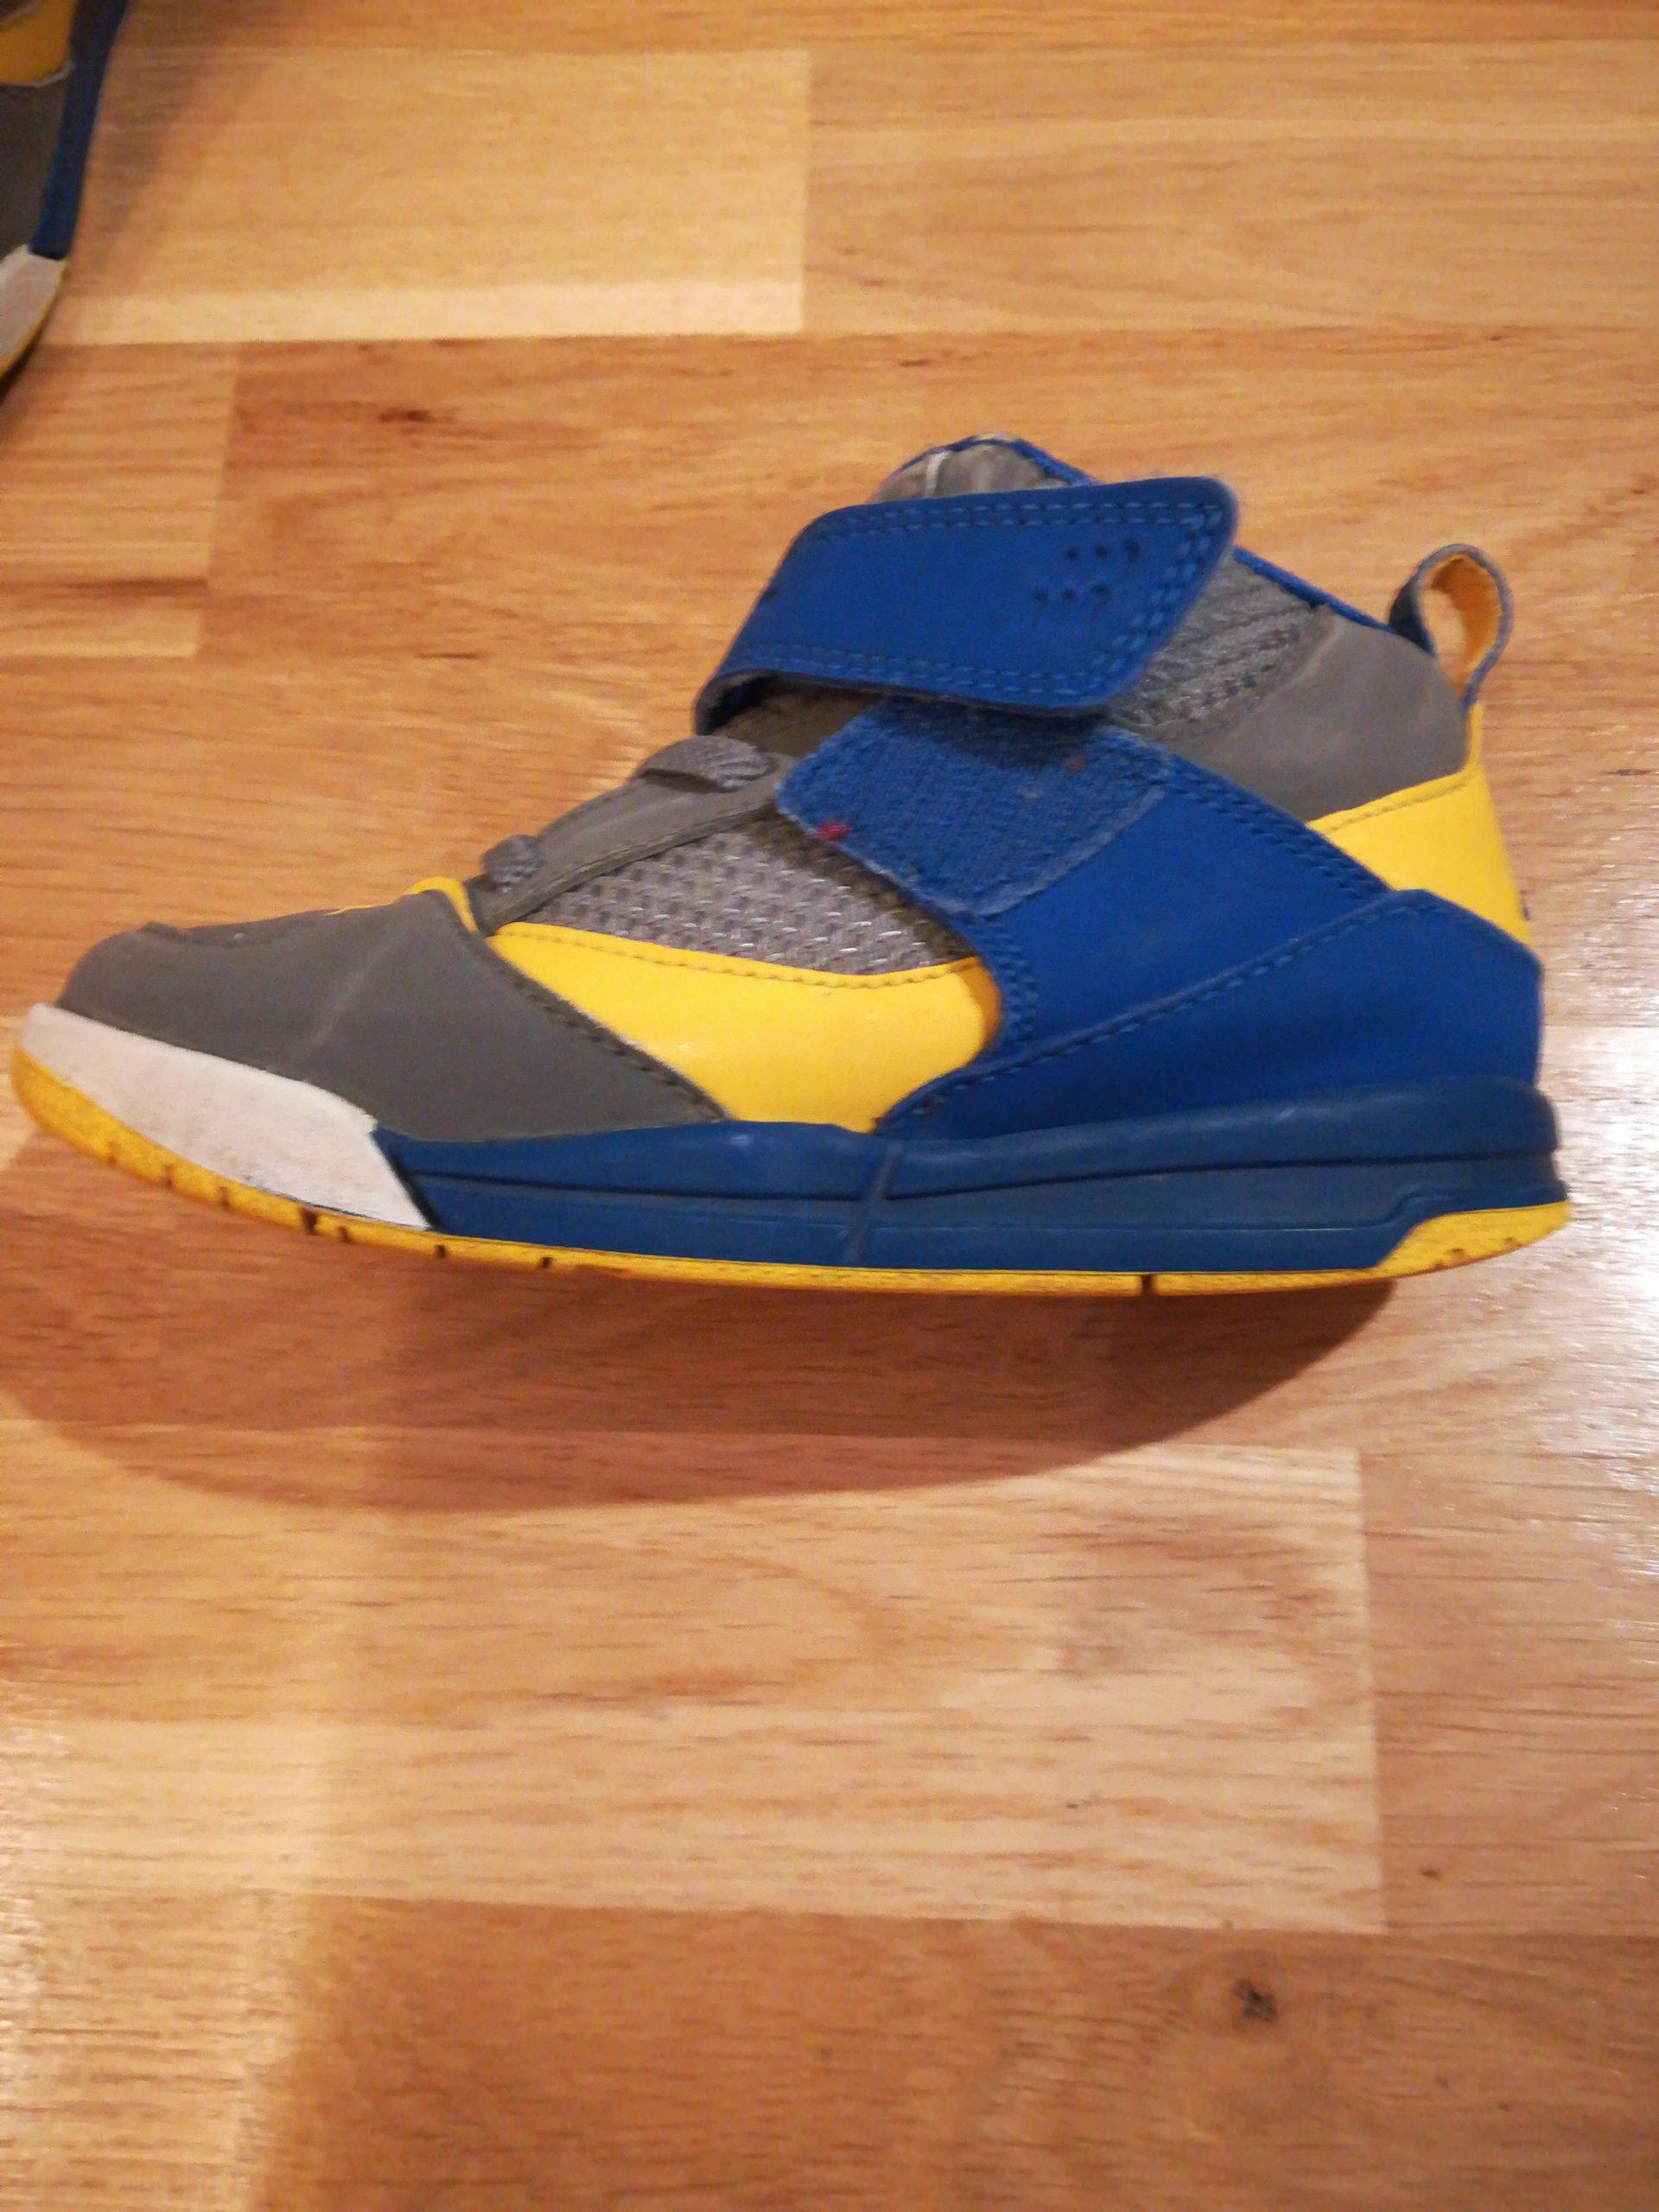 82d743dde8e2 Buciki dziecięce sportowe Nike Jordan 27 rozmiar - 7084528387 ...